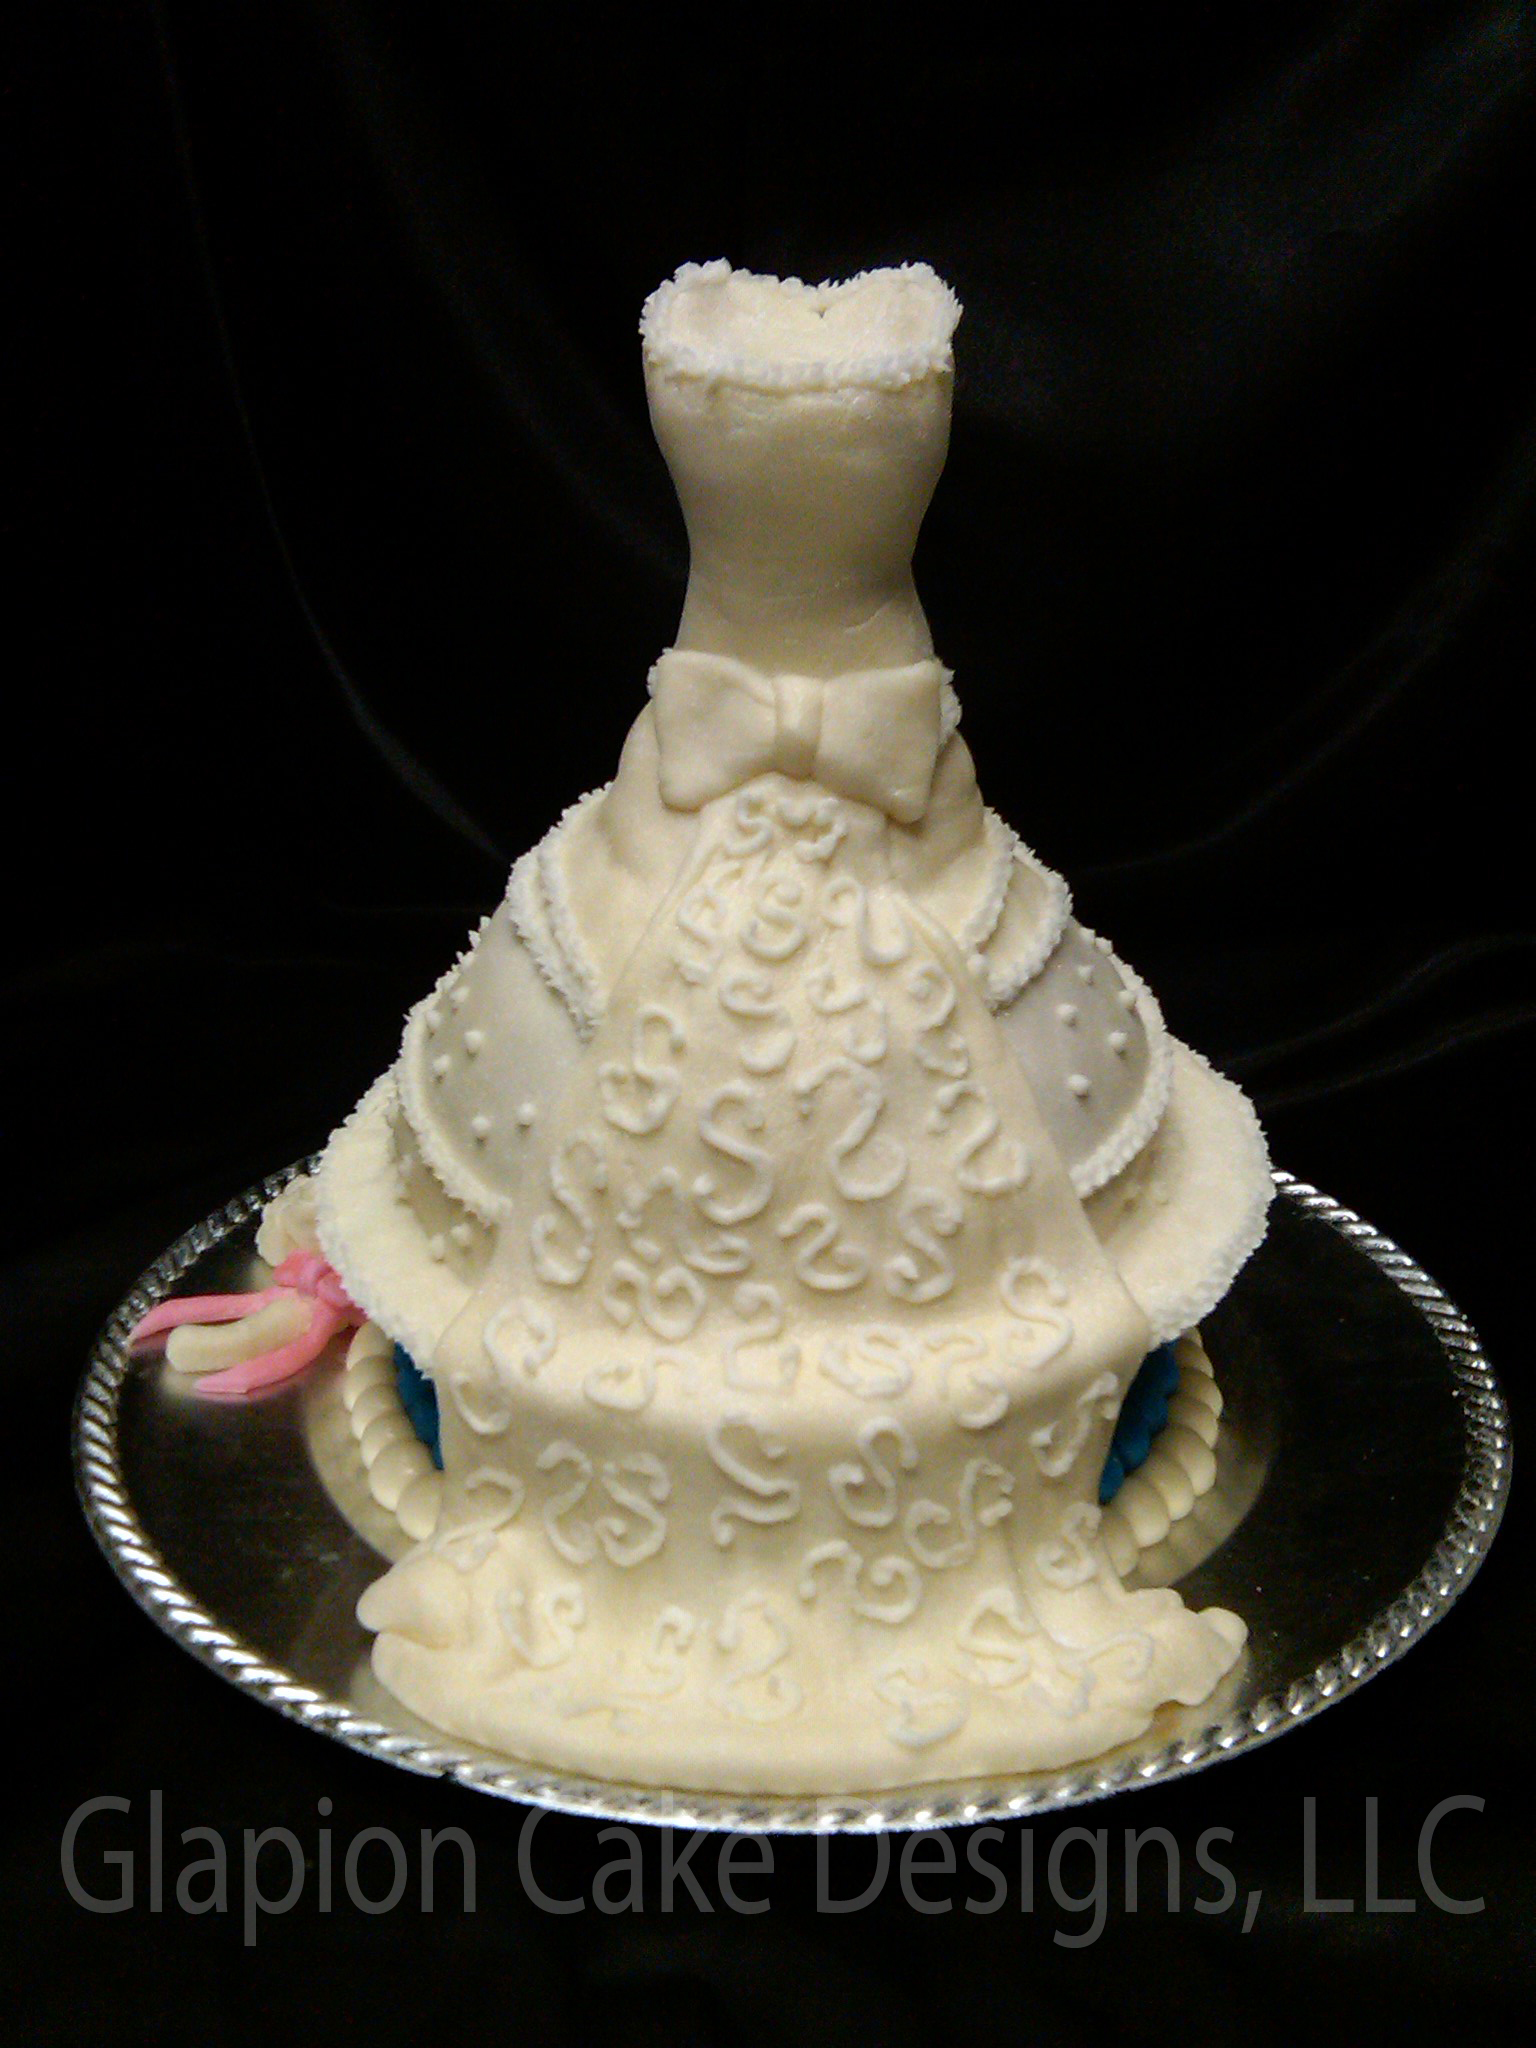 Glapion Cake Designs Home